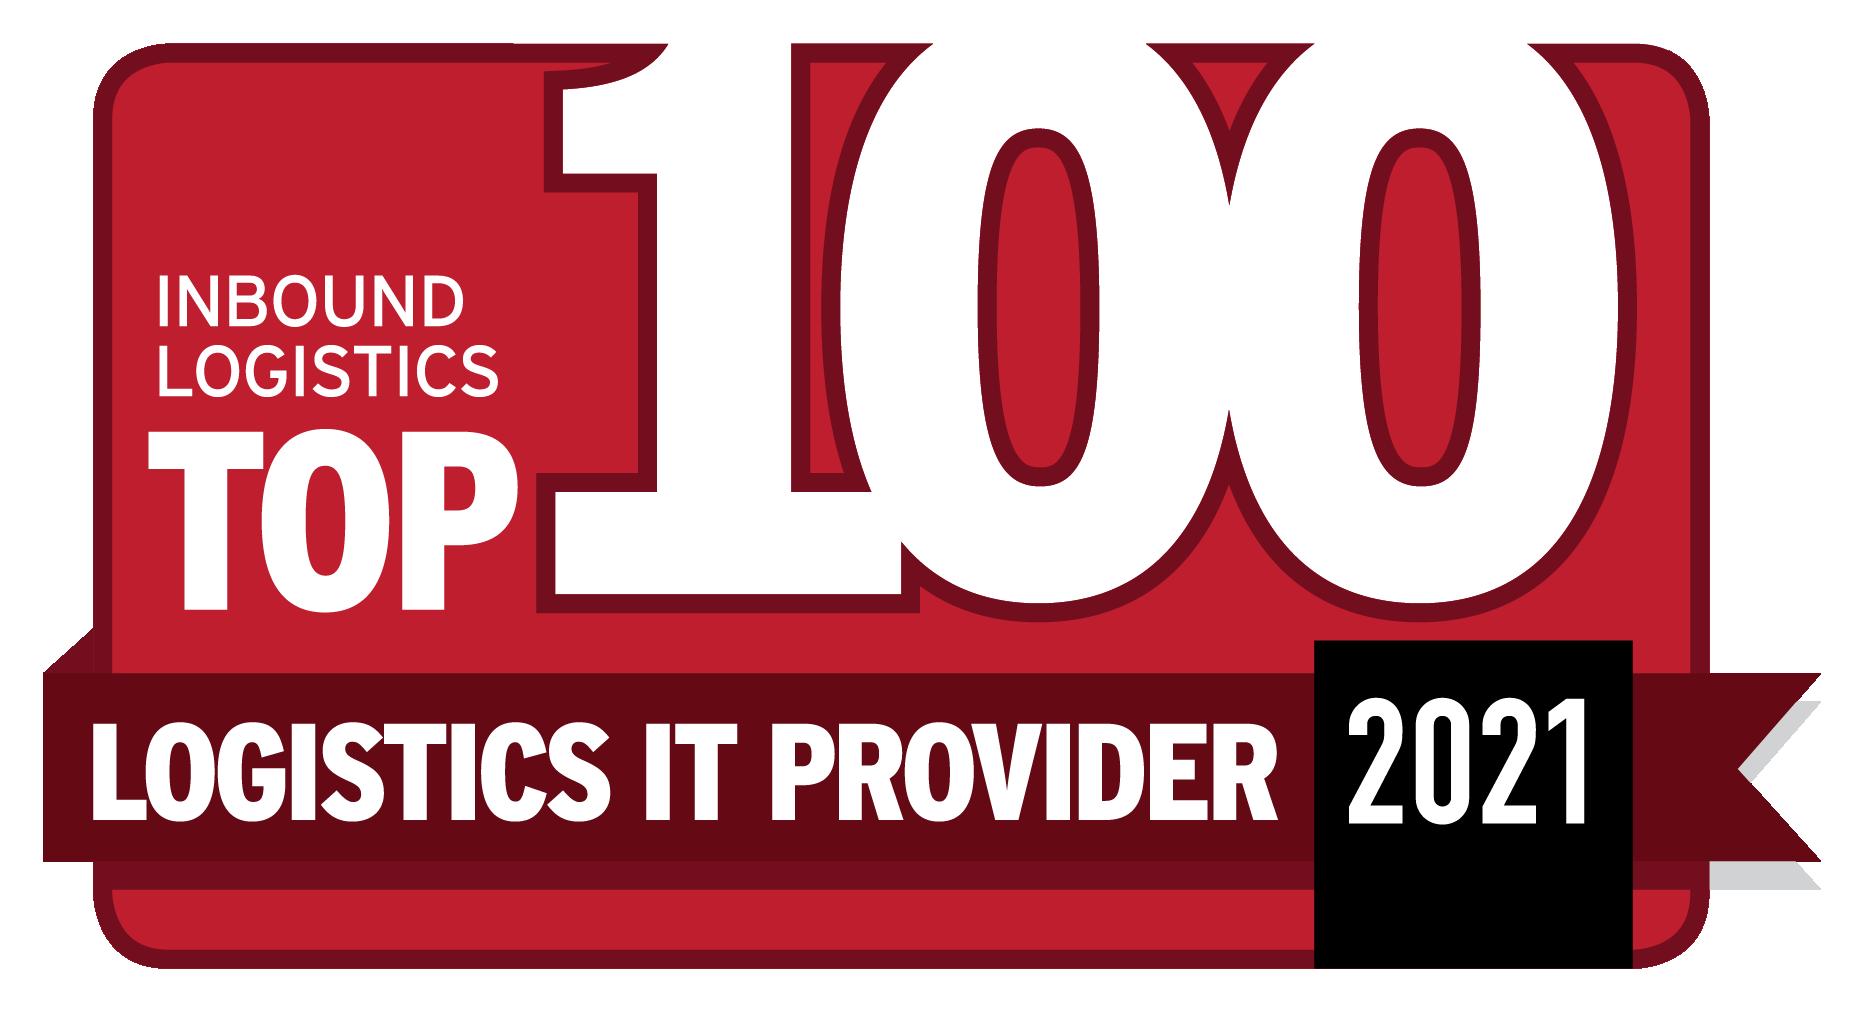 Inbound Logistics Top 100 Logistics IT Providers 2021